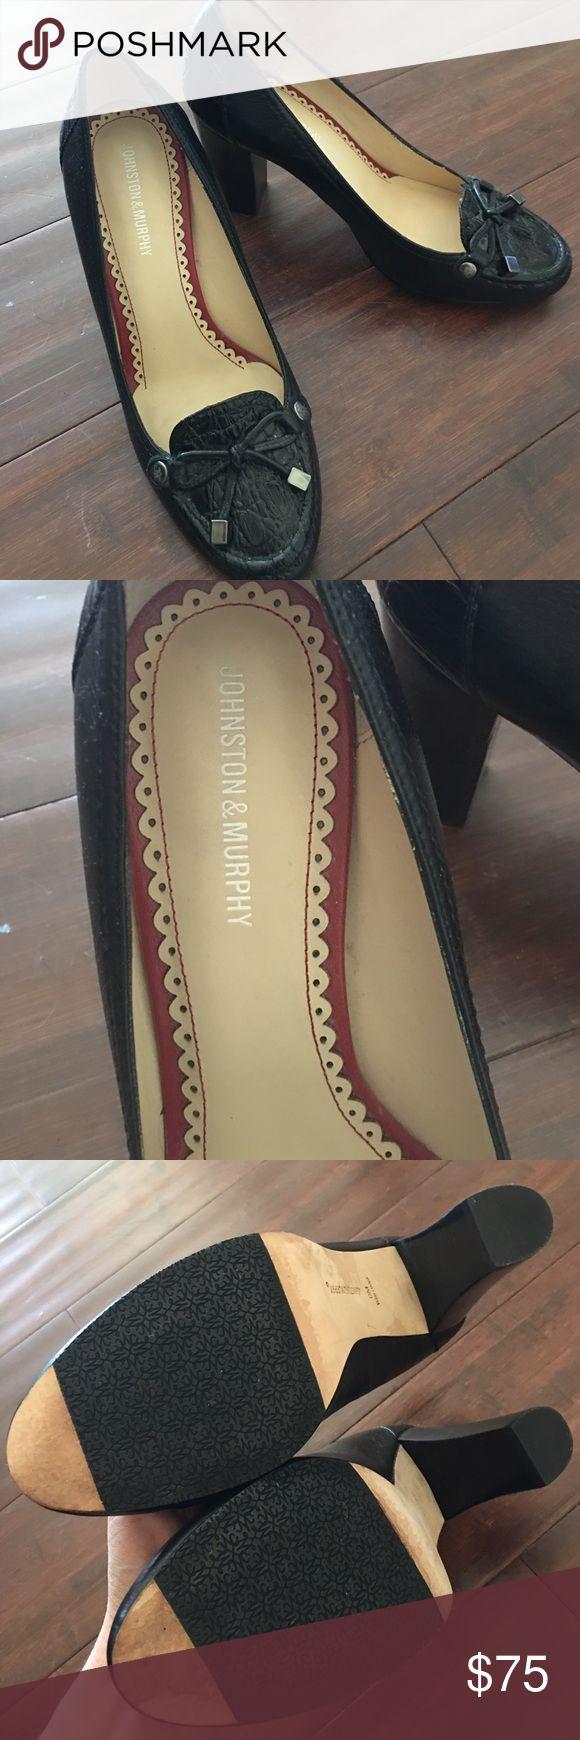 Johnston & Murphy loafer/ heels! Leather - lovely! Like new!!! Johnston & Murphy loafer/ heels! Leather - lovely! Johnston & Murphy Shoes Heels